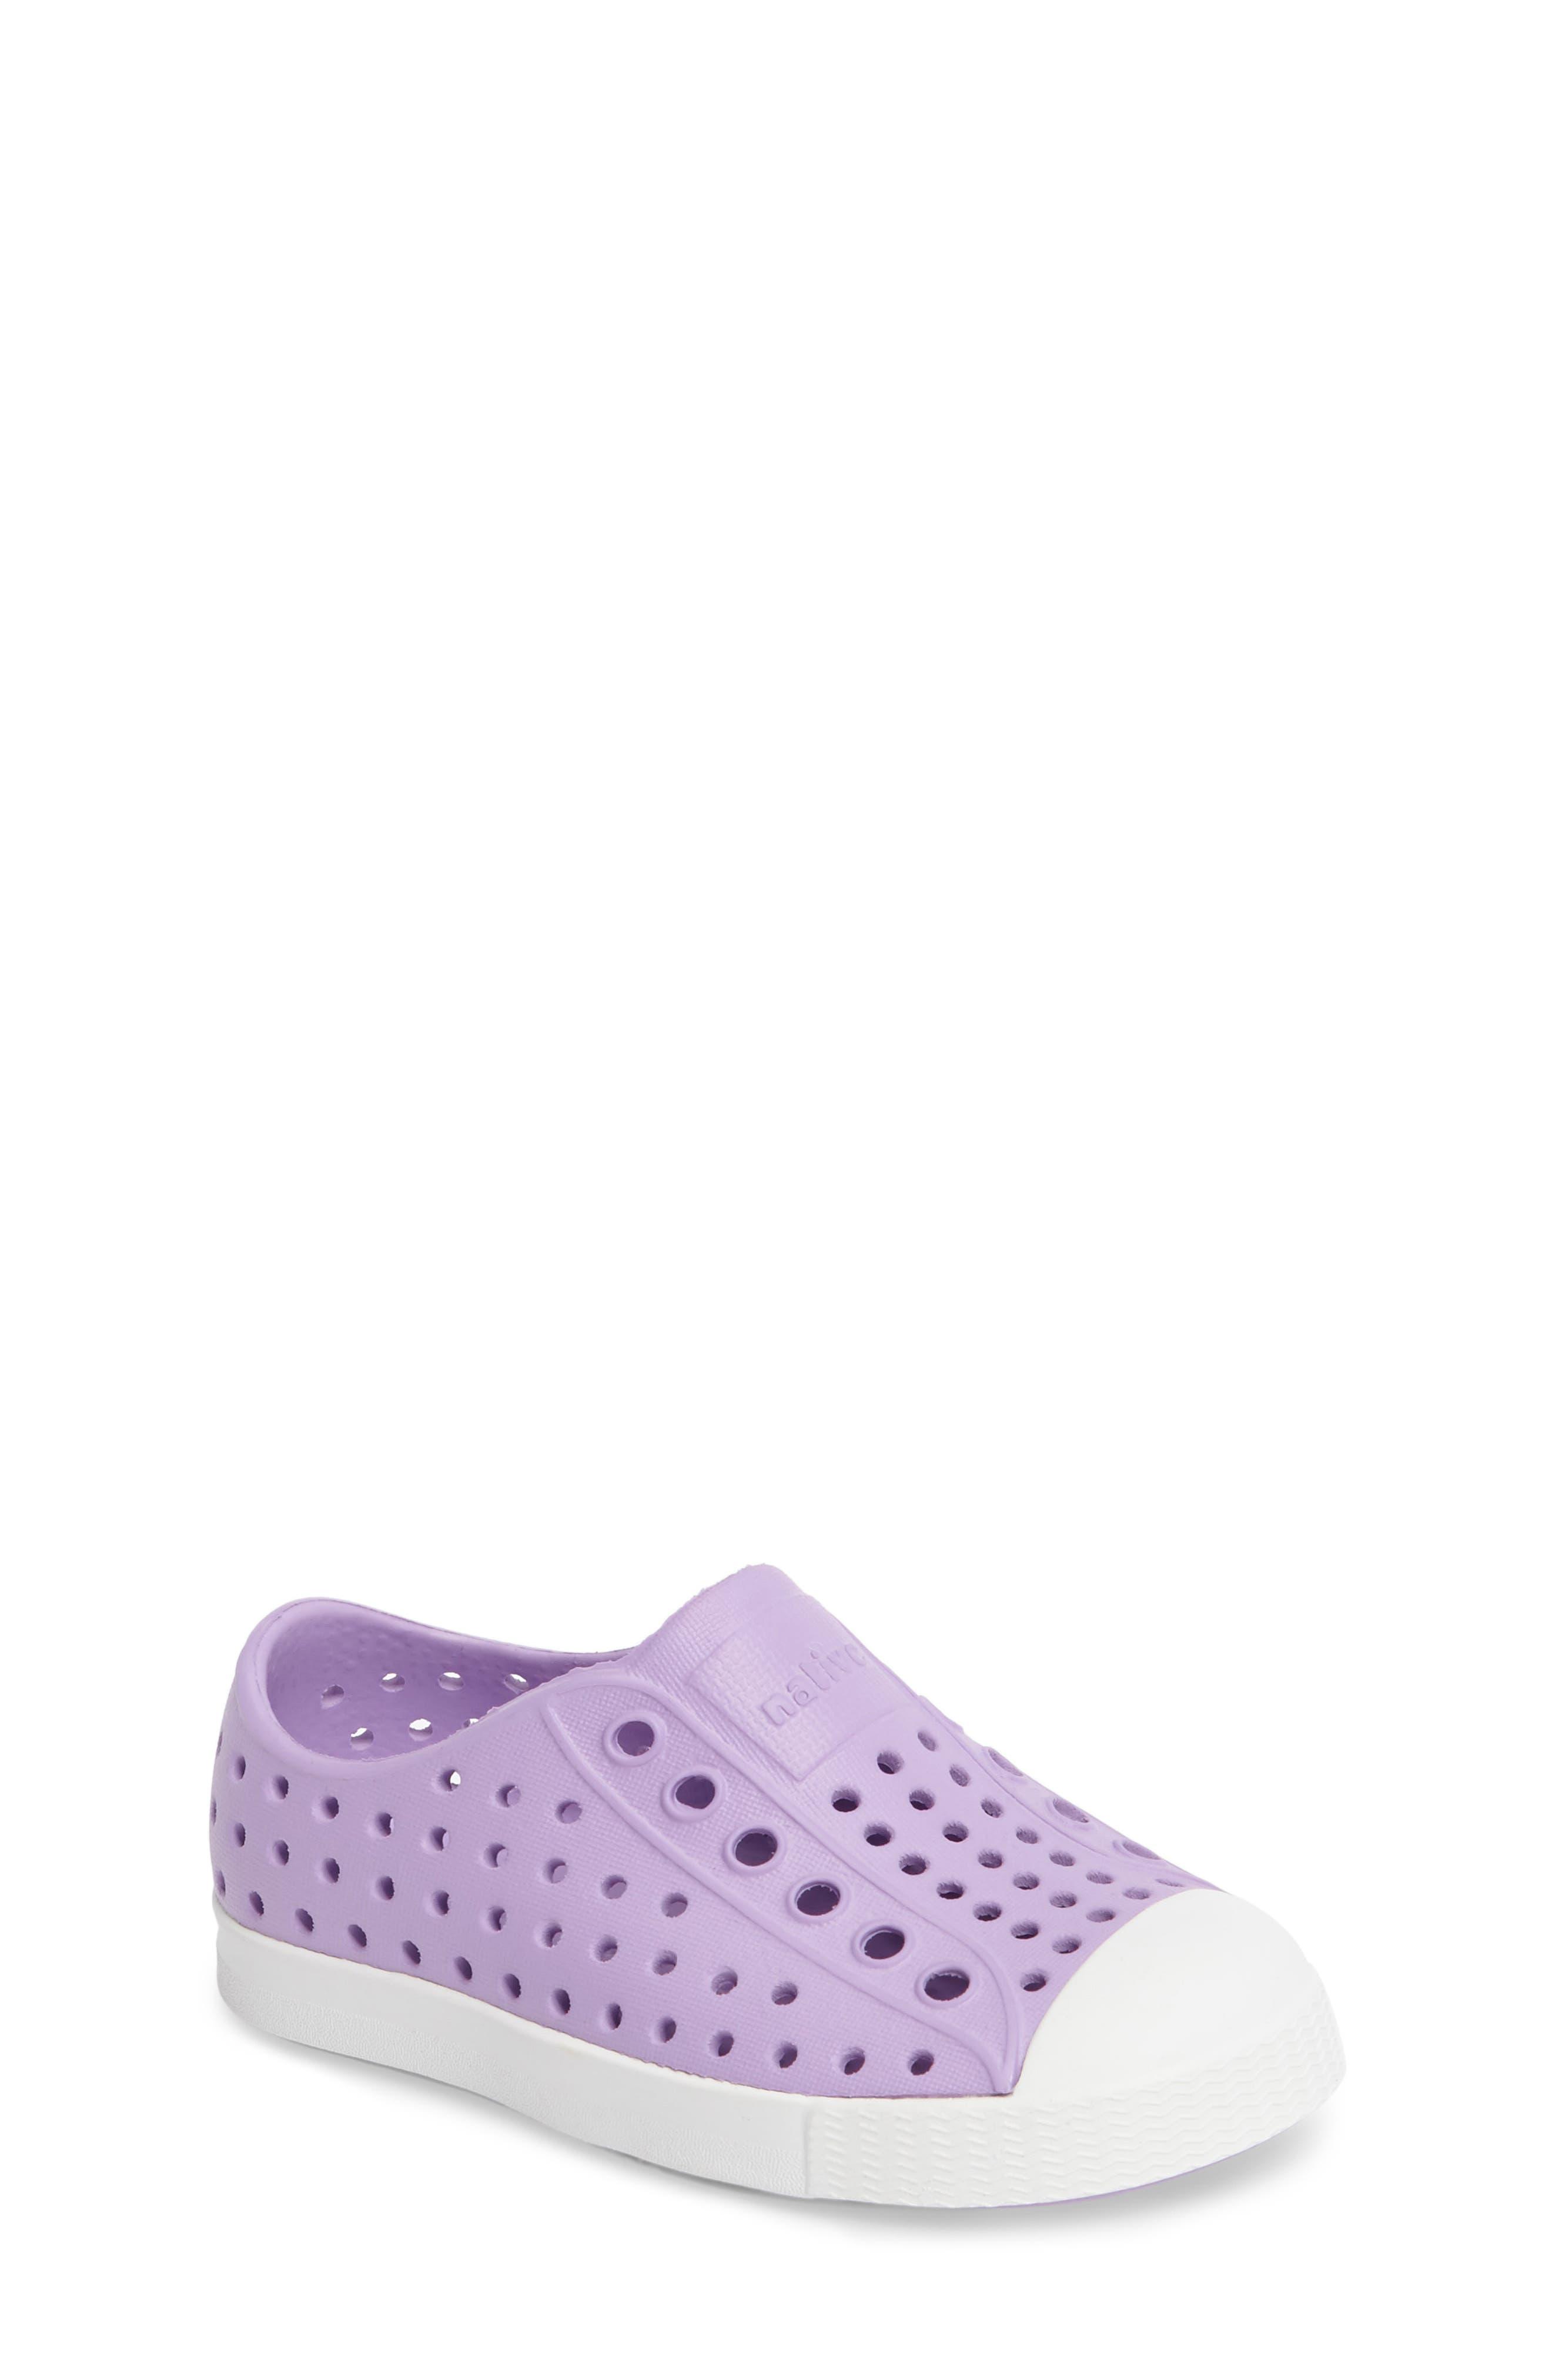 'Jefferson' Water Friendly Slip-On Sneaker,                             Main thumbnail 54, color,